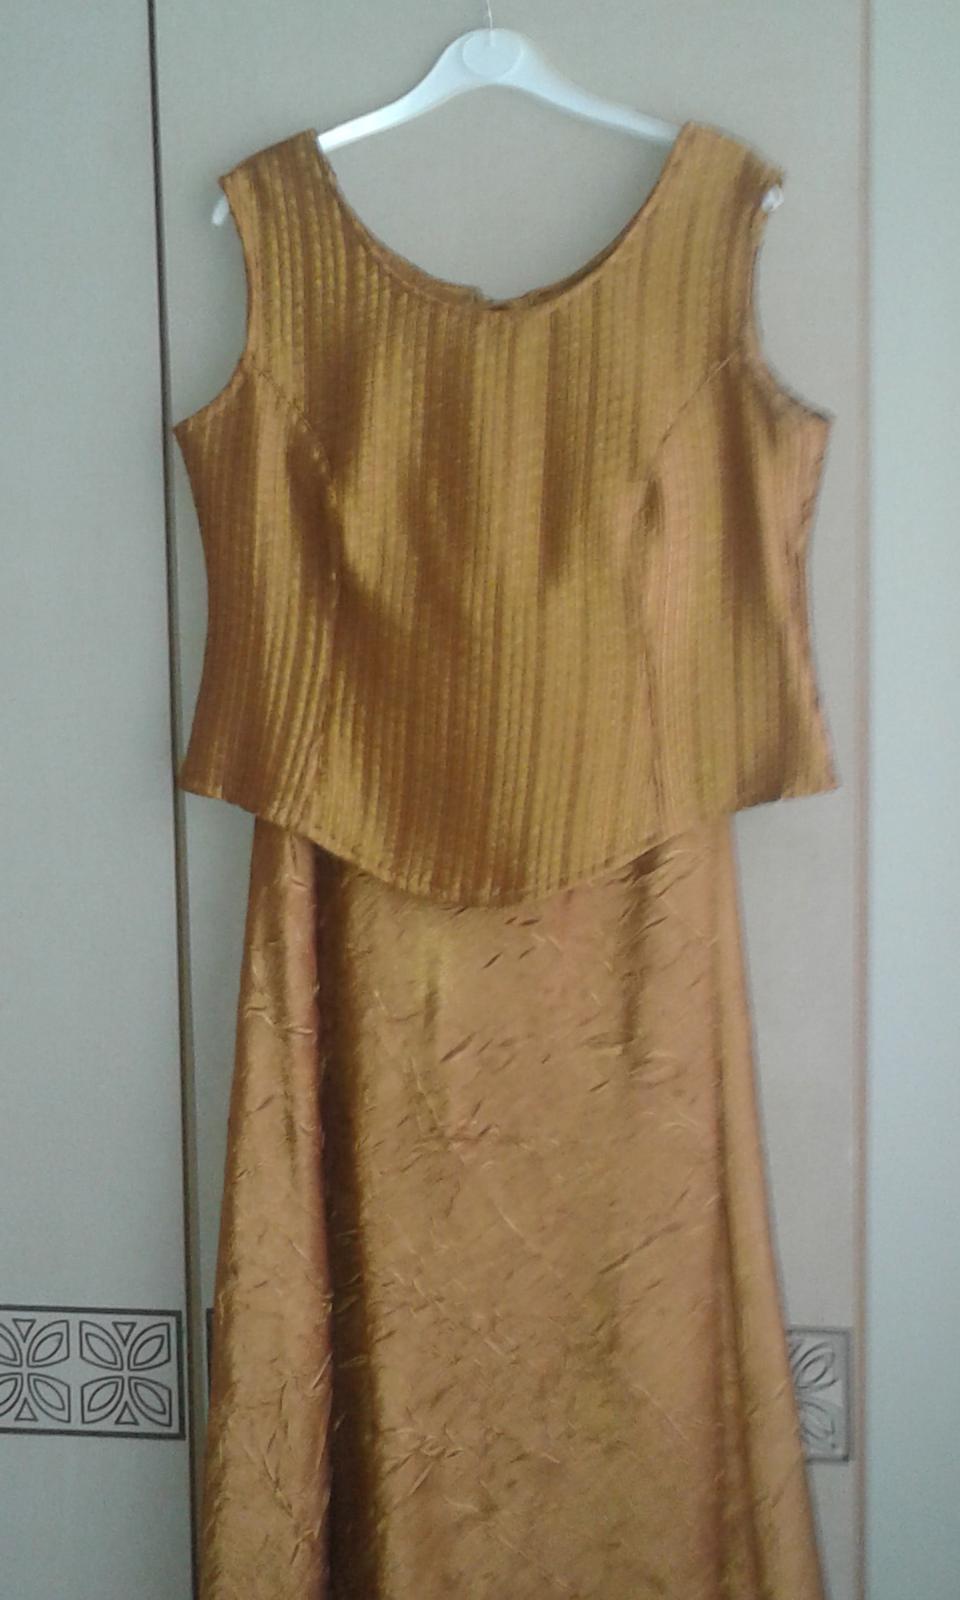 Zlaté príležitostné šaty č.XL - Obrázok č. 1